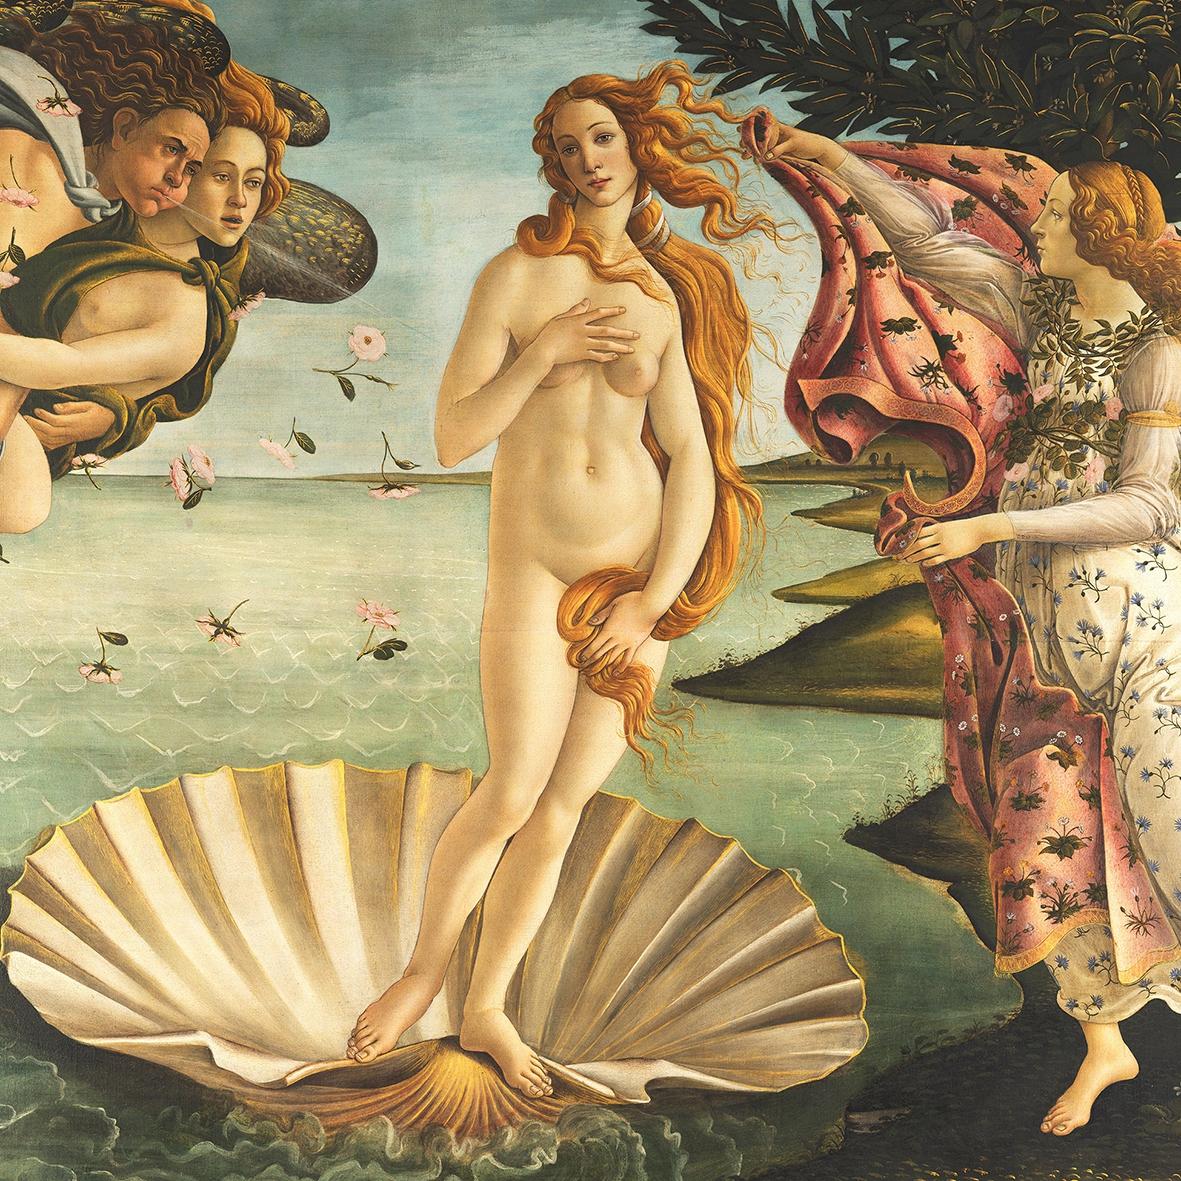 Servilletas 33x33 cm - Birth of Venus